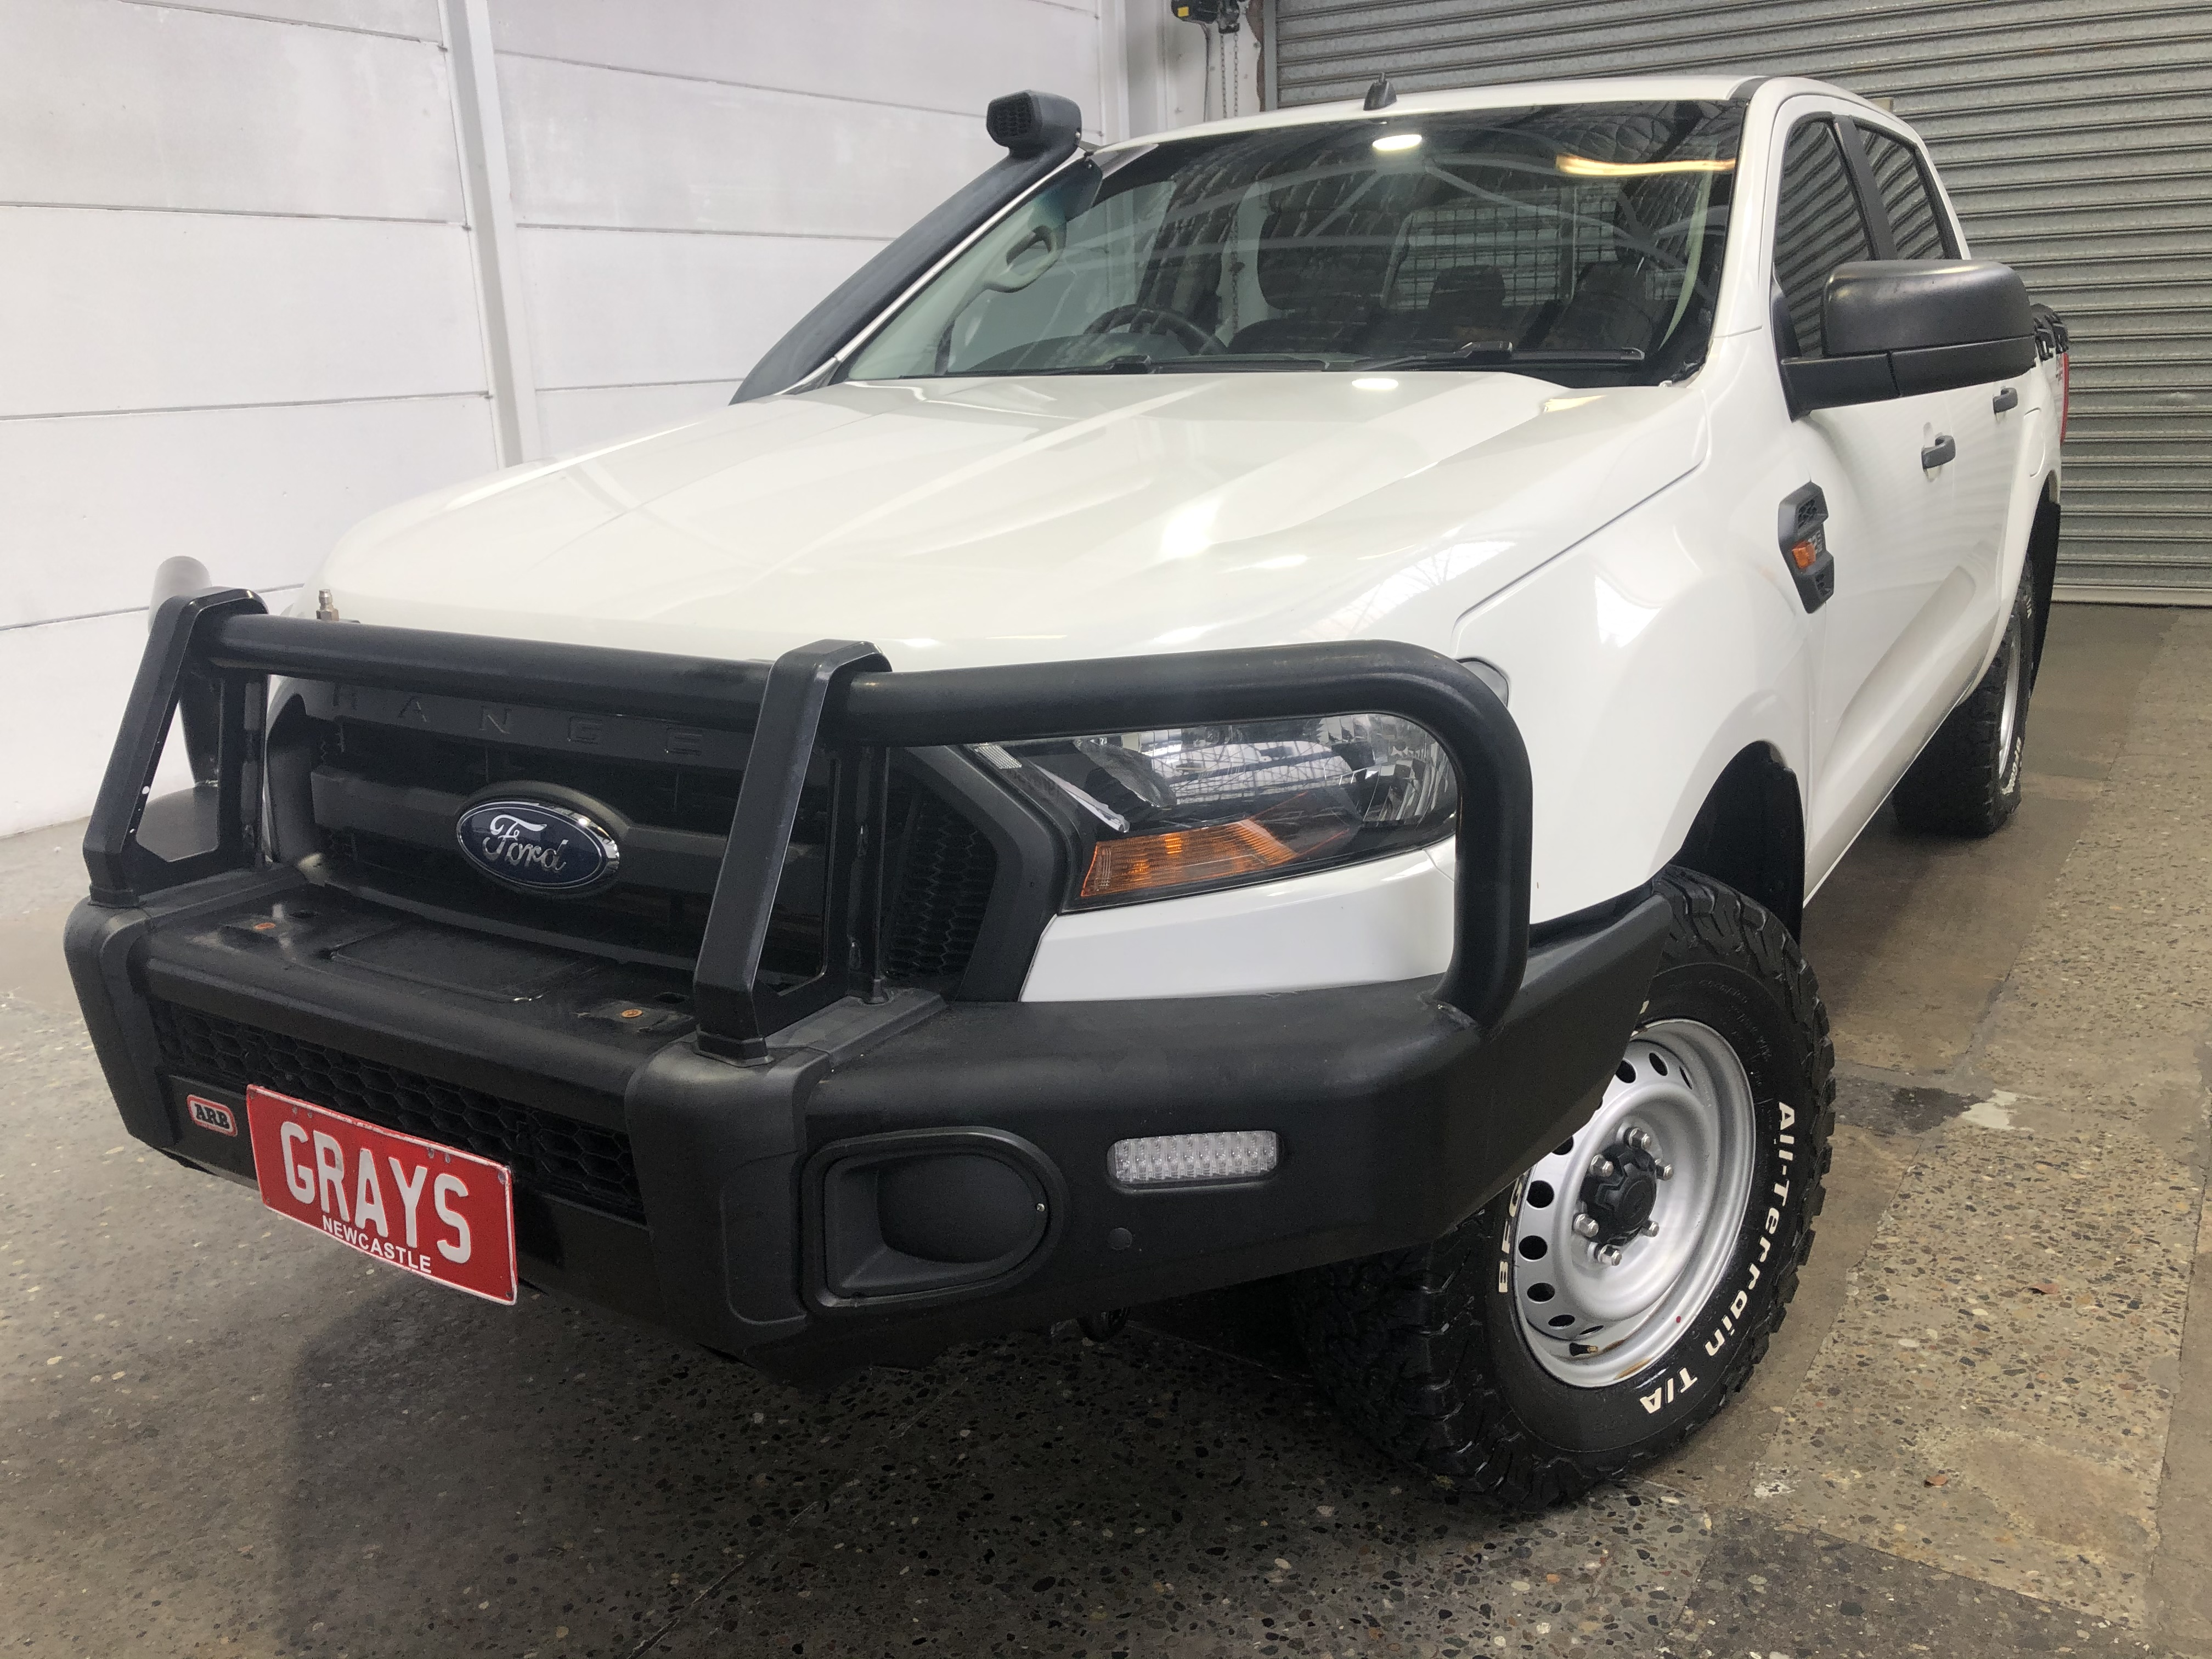 Ford Ranger XL 4X4 PX II Turbo Diesel Automatic Dual Cab